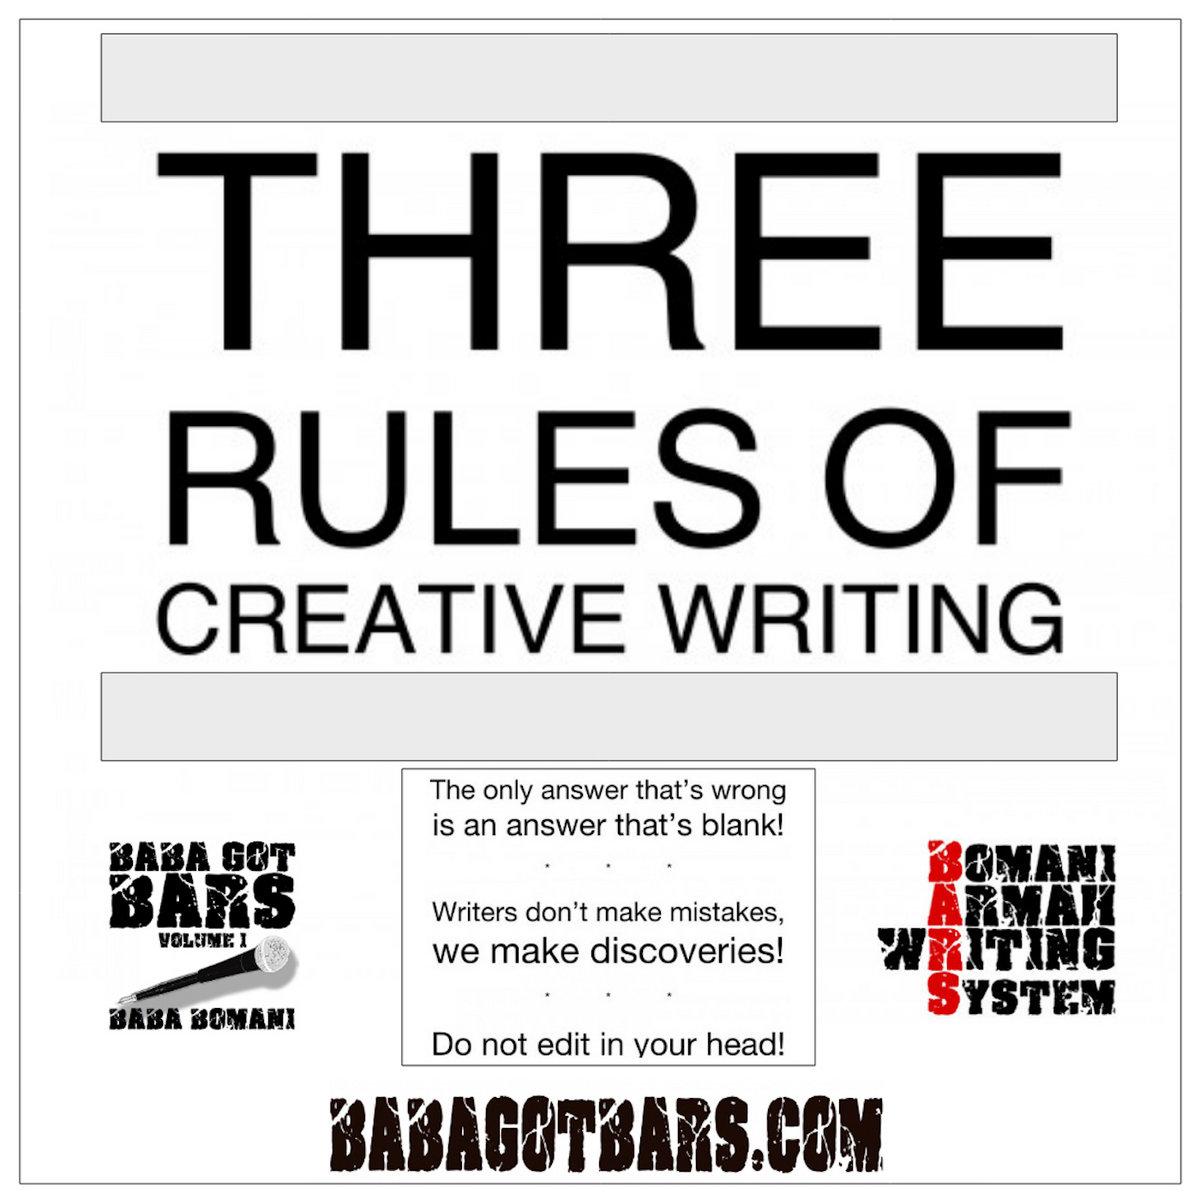 creative style of writing